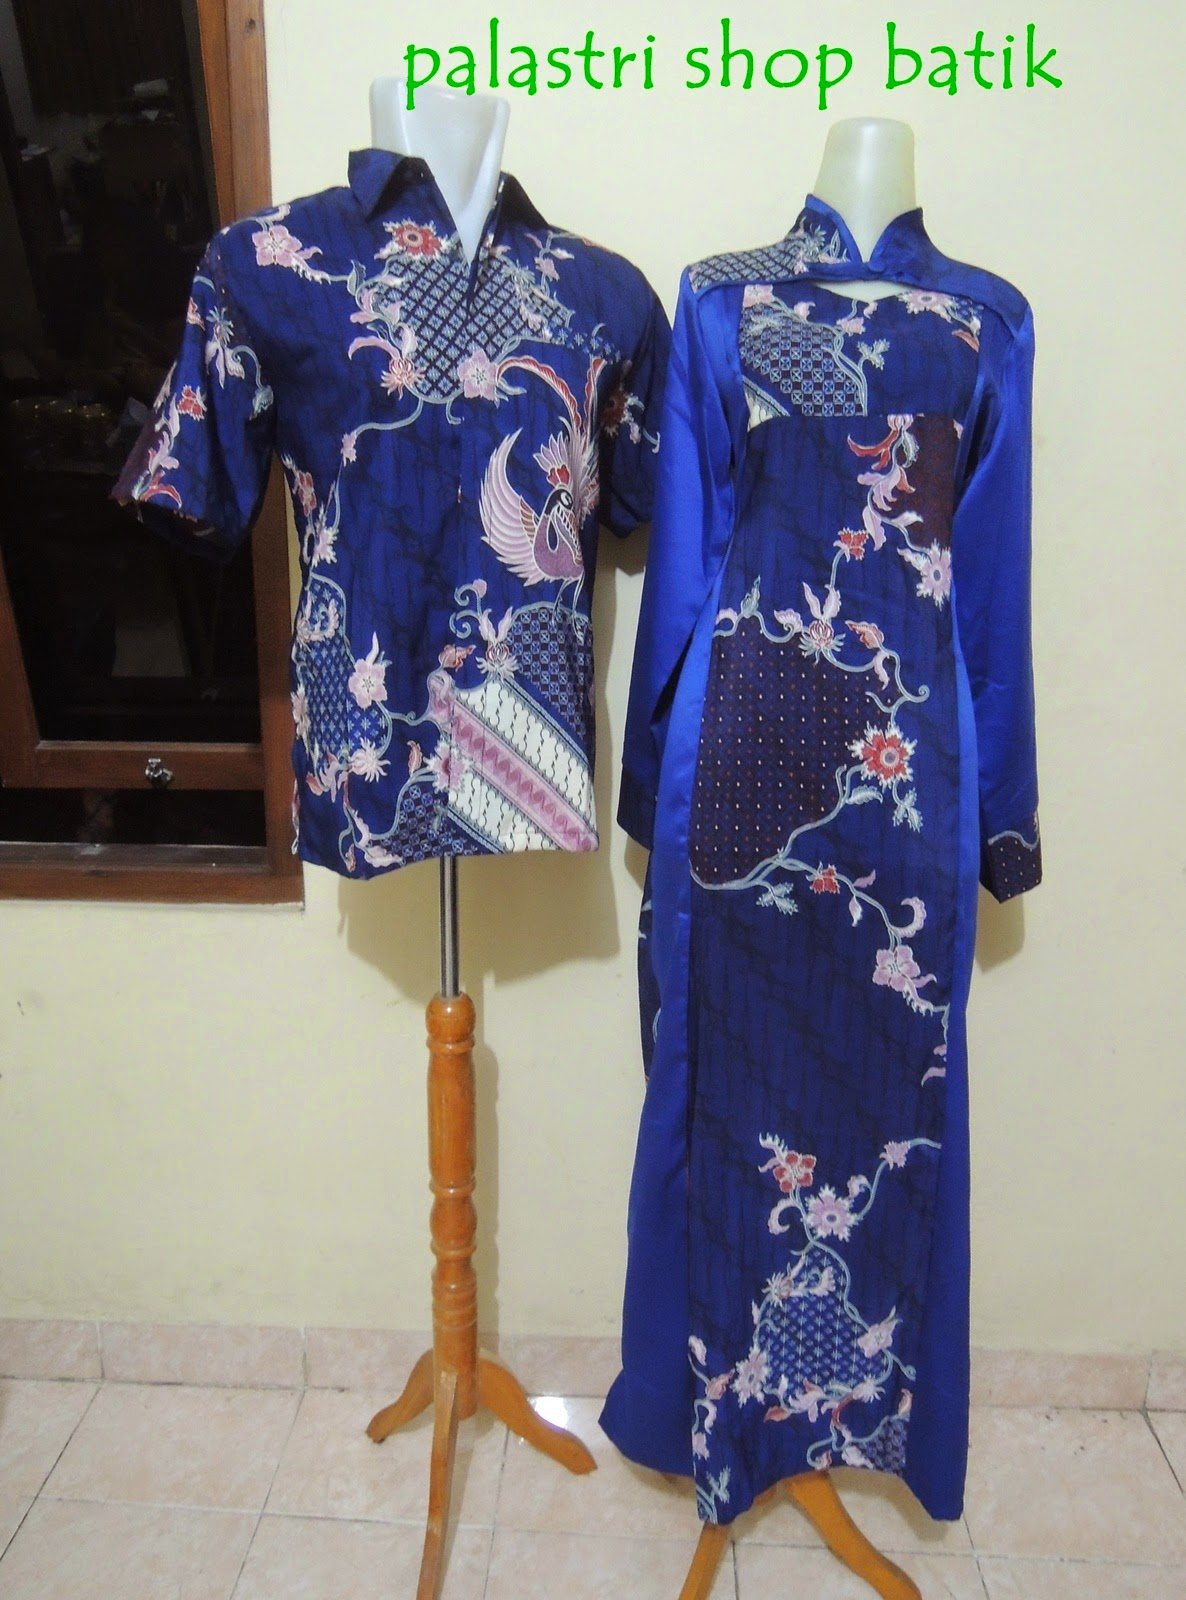 Palastri Shop Gabriella 2 Sarimbit Gamis Semi Sutera Koleksi Dress Cantika Dr Baju Muslim Anak Perempuan Spandek Biru Terbaru Warna Dasar Dan Abu